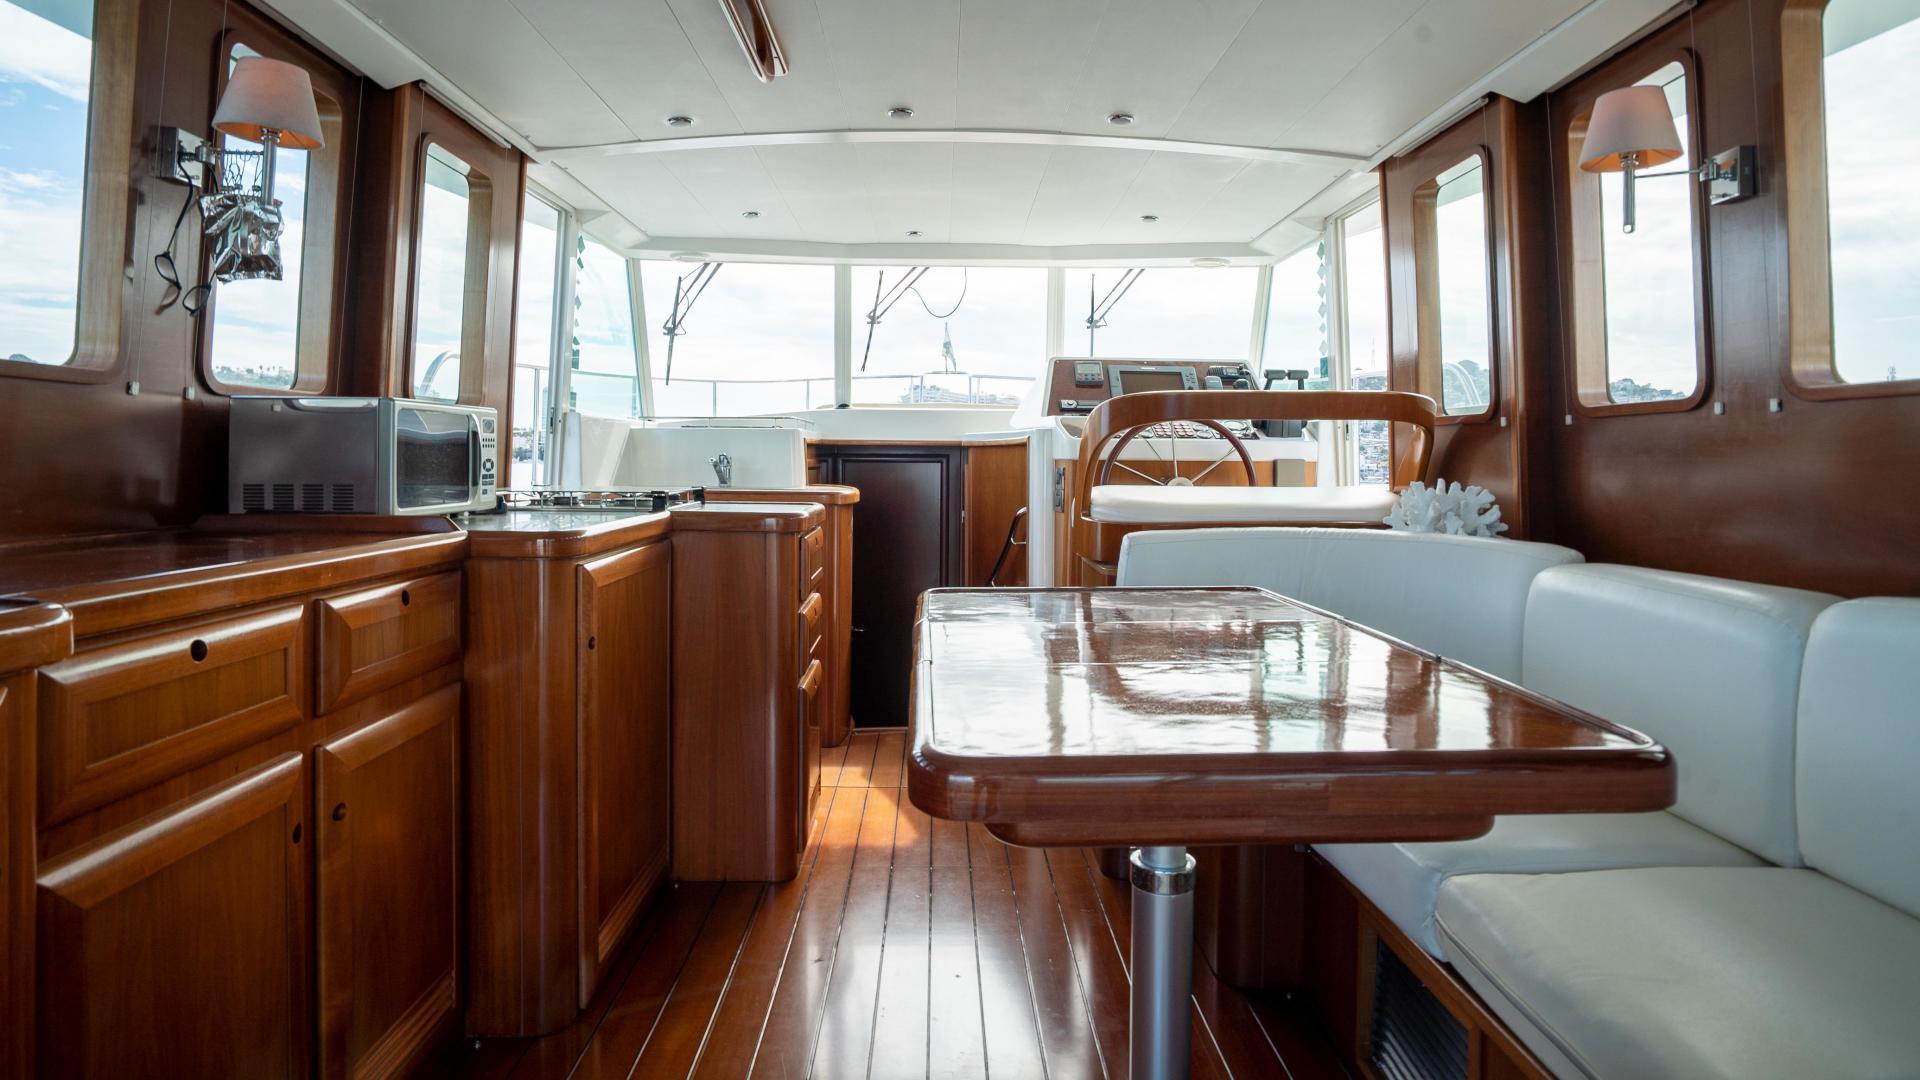 Beneteau-Swift Trawler 2008-Amadeus Acapulco-Mexico-1487060 | Thumbnail